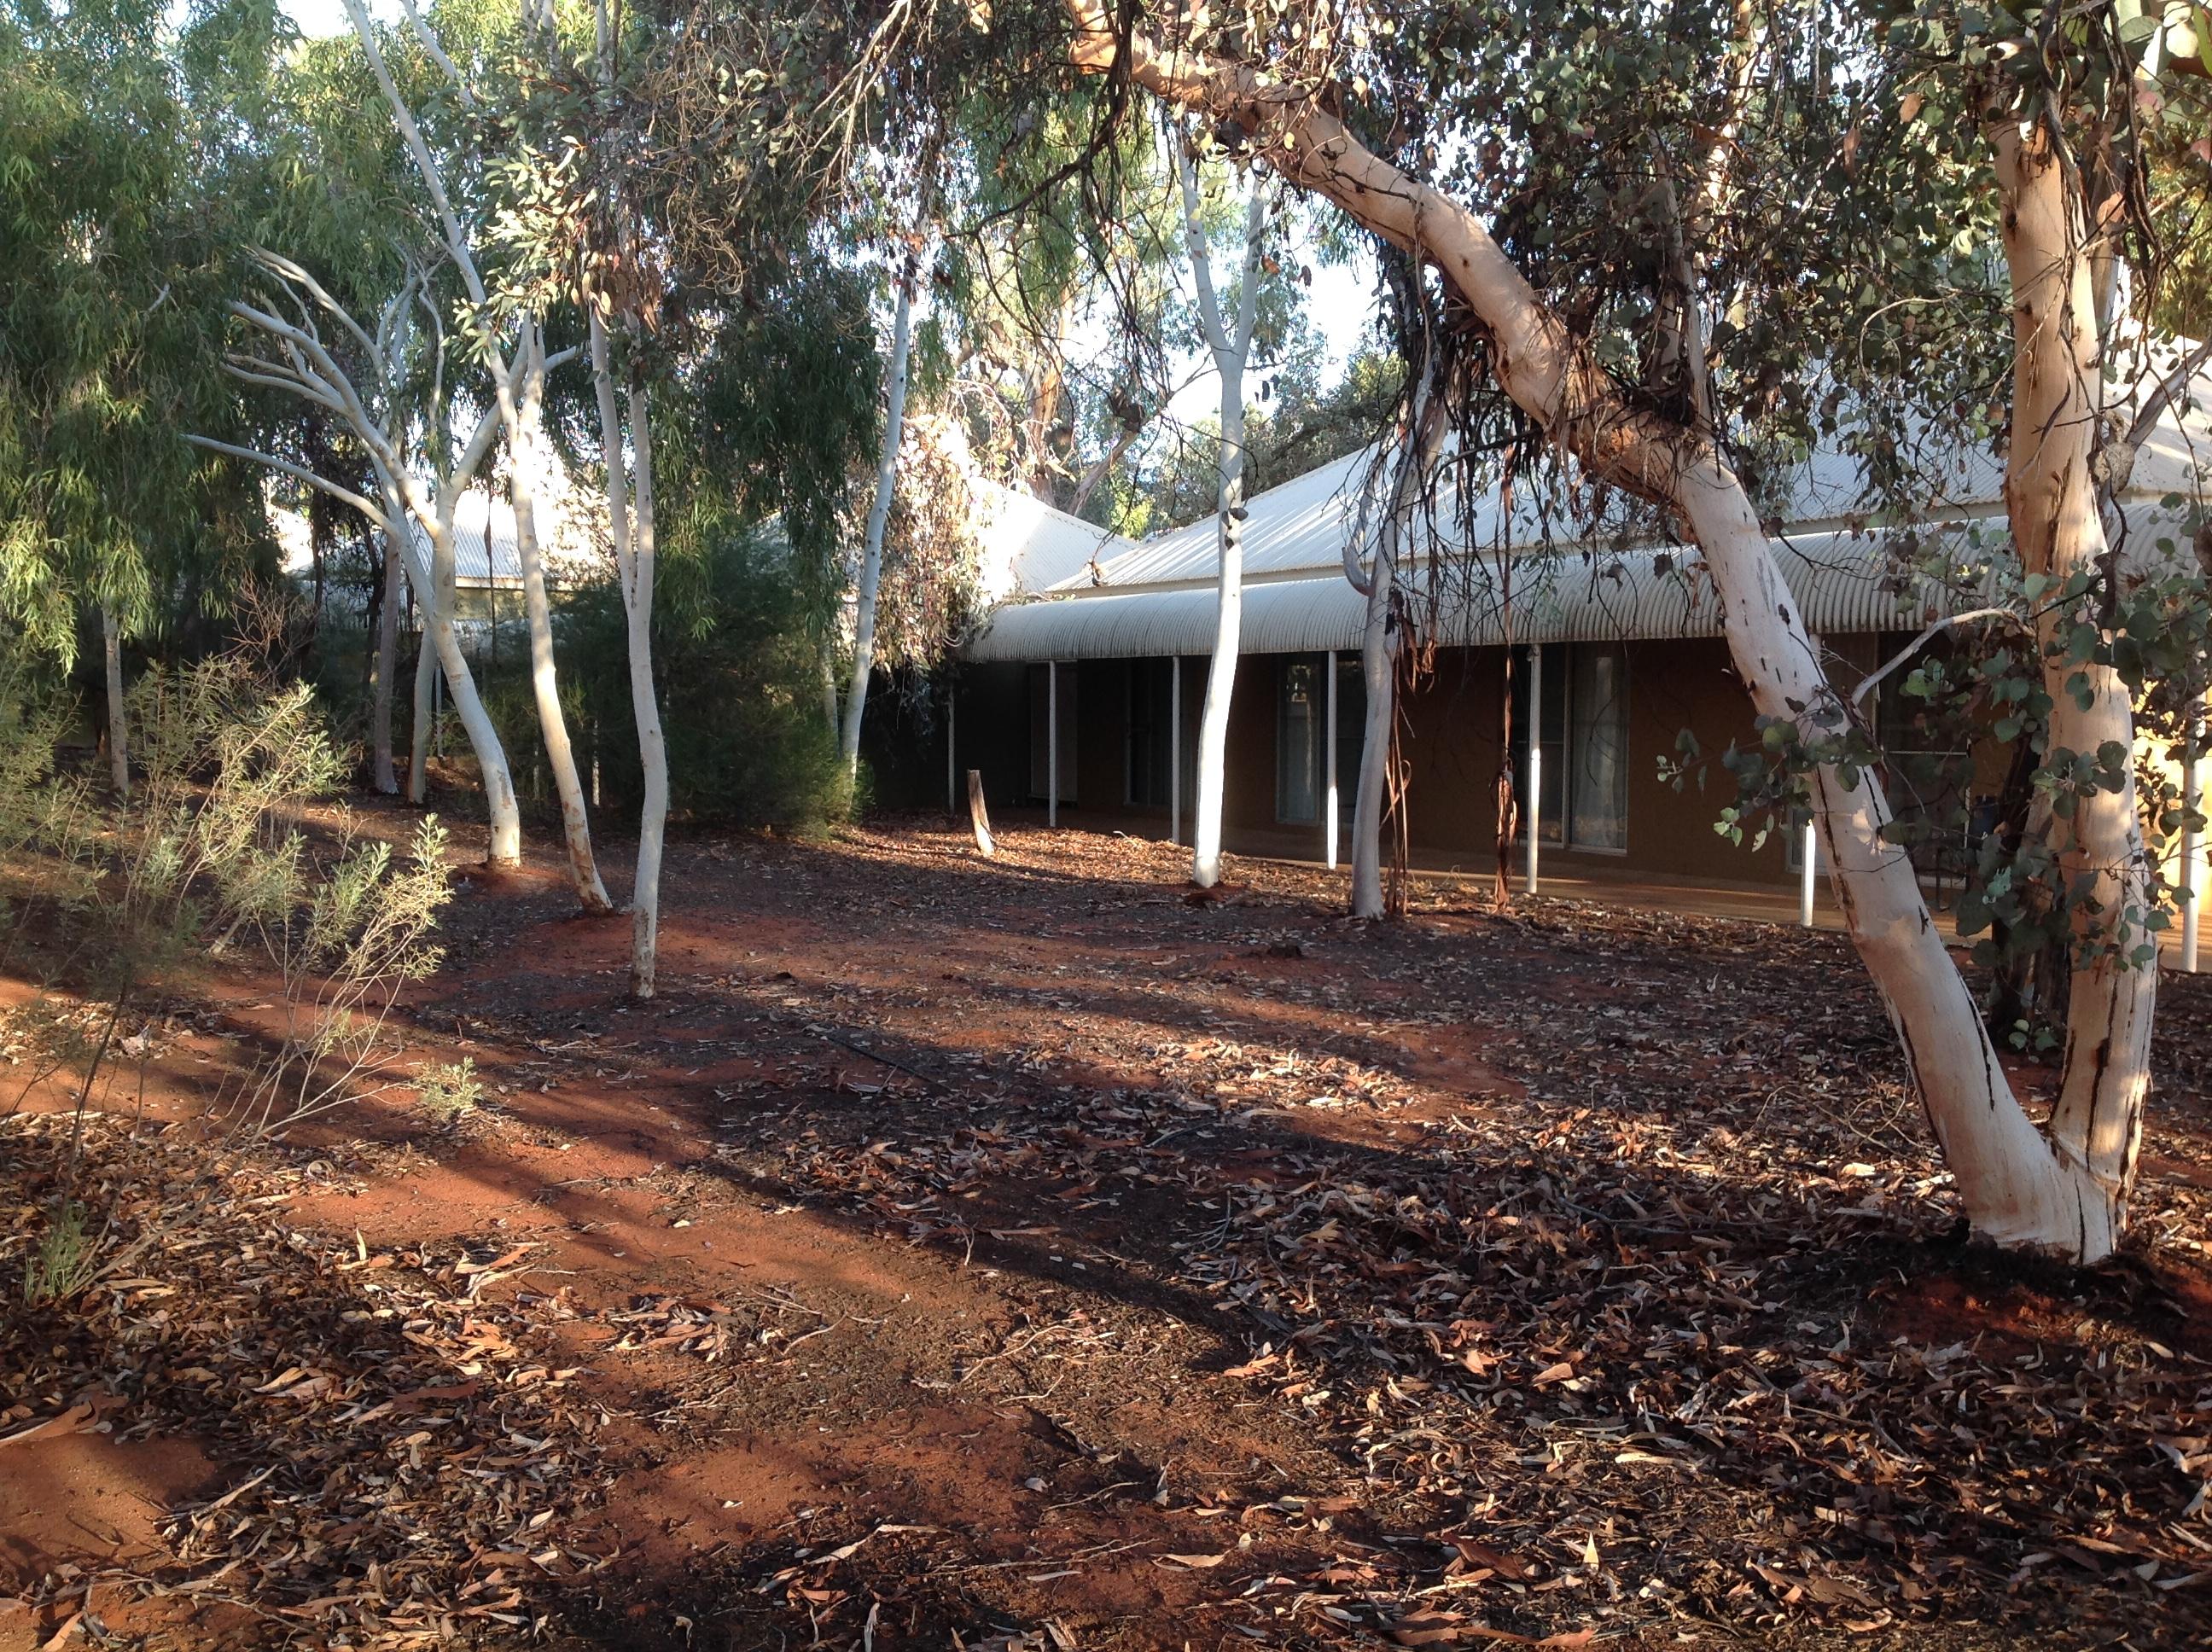 File:Outback Pioneer Hotel And Lodge   Ayers Rock Resort, Yulara NT.jpeg